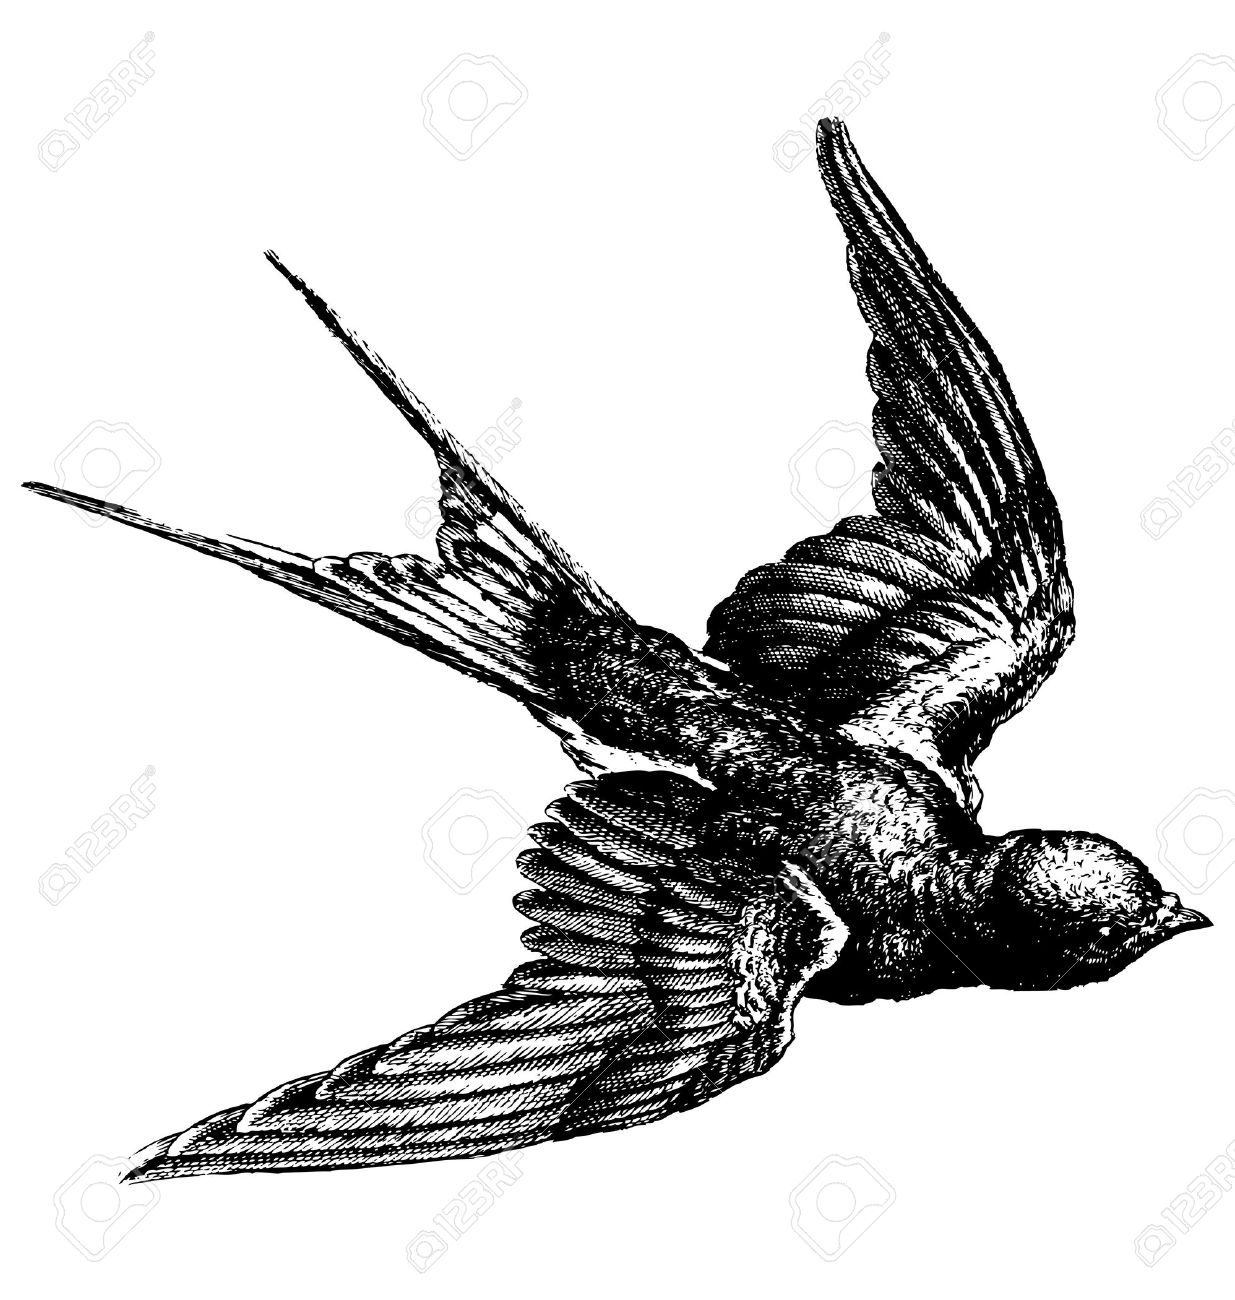 Vector hand drawing sketch of a flying bird Stock Vector - 37115191